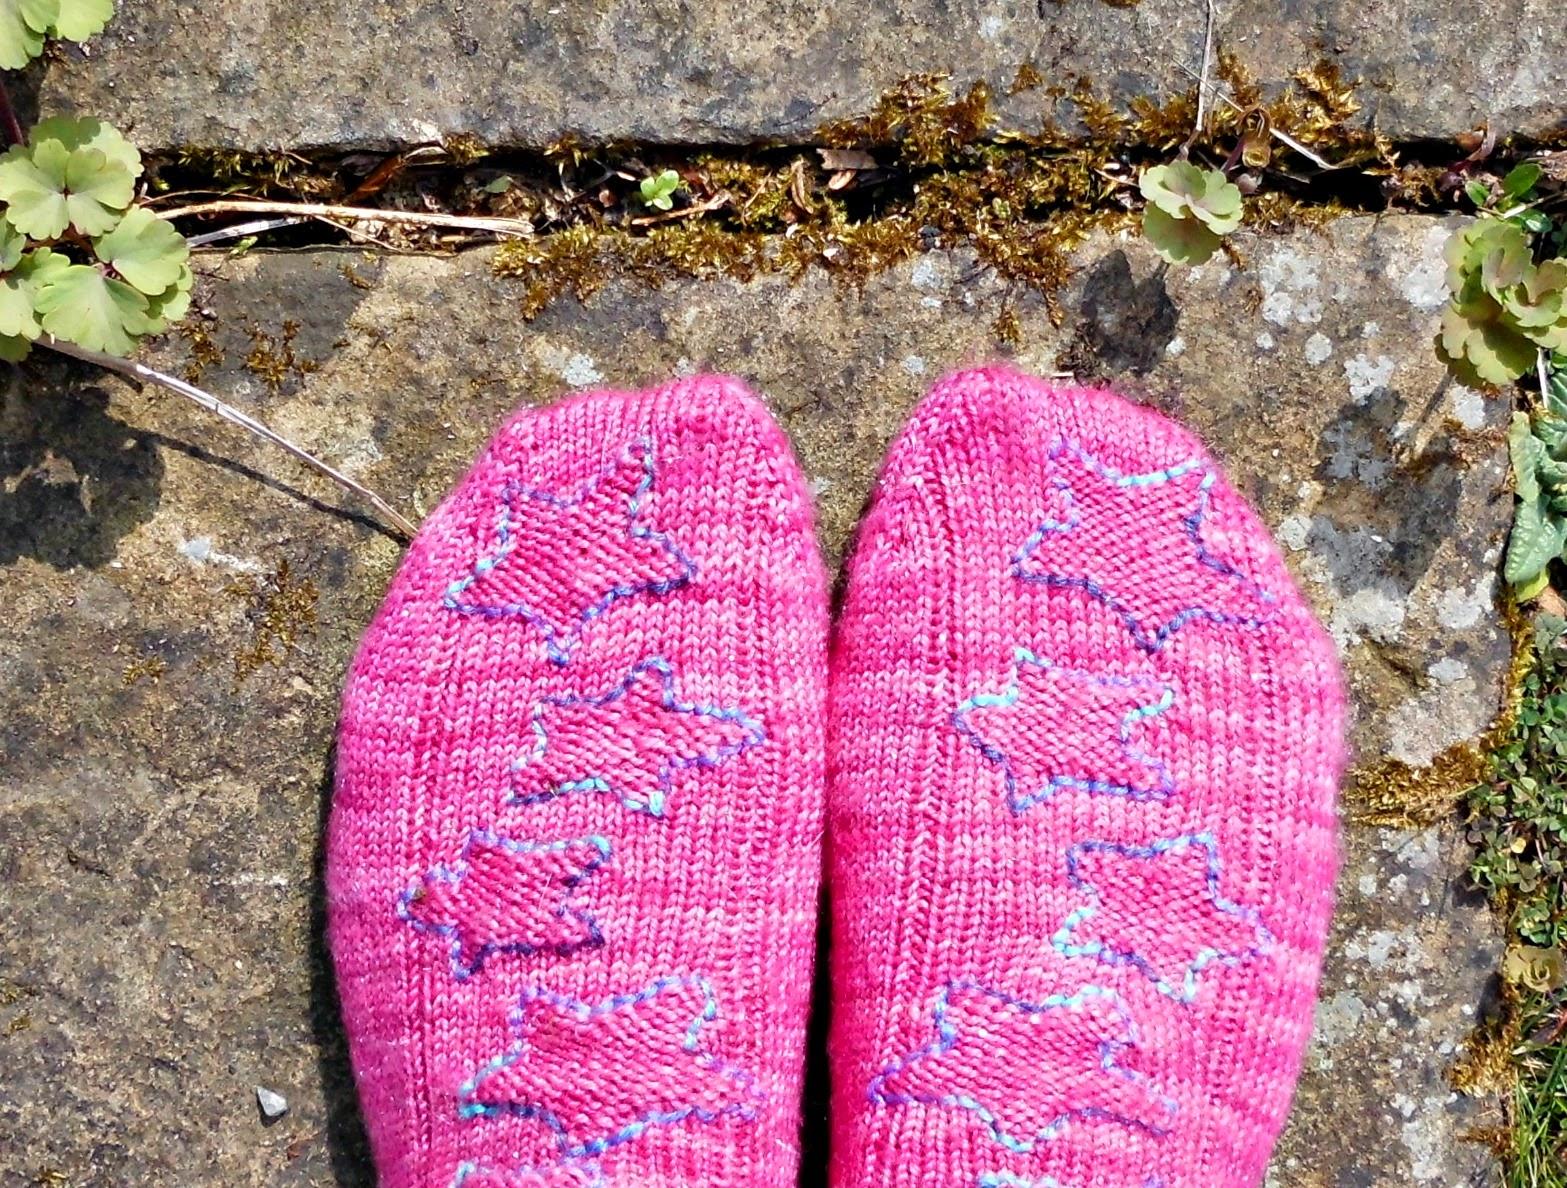 Twinkle Star socks